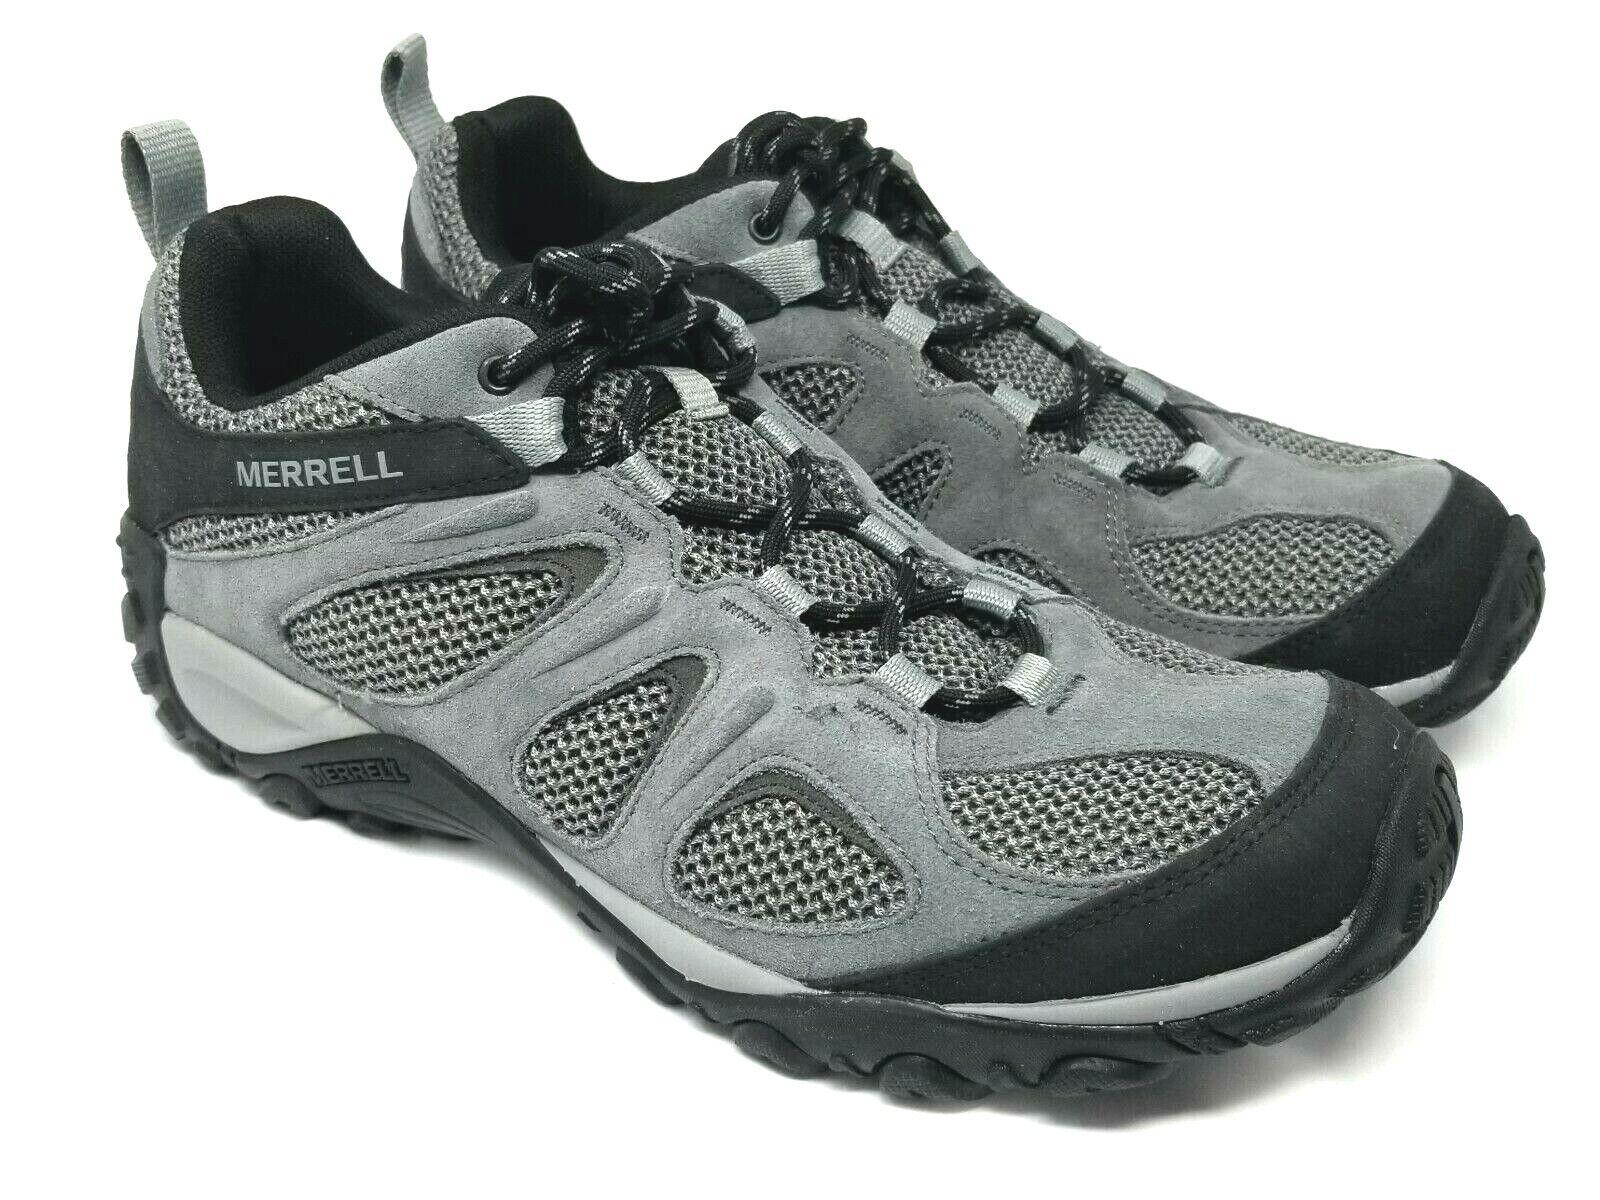 Merrell Yokota 2 Men's TRAIL Hiking Shoes Castlerock Gray Size 11 EUR 45 T288